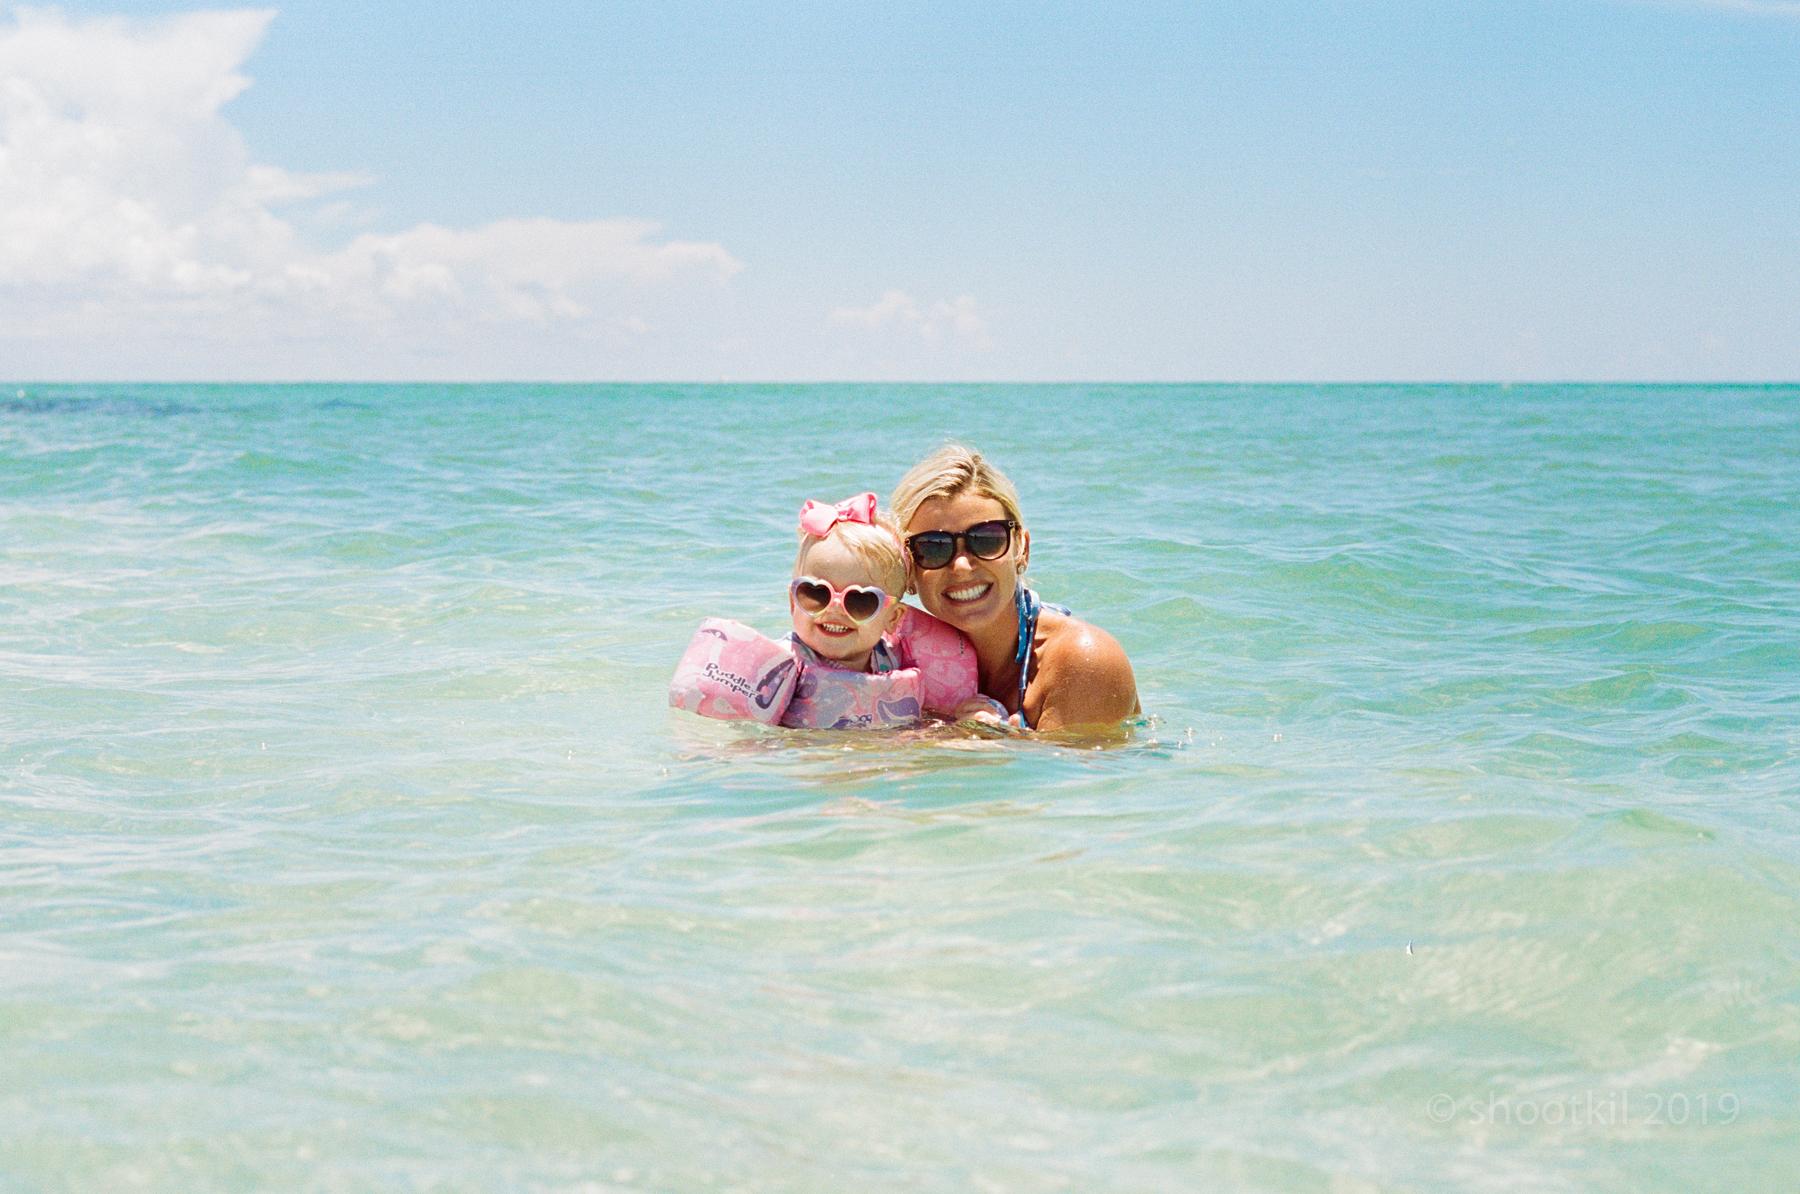 Dog-Beach-Ripley-07272019-13.jpg